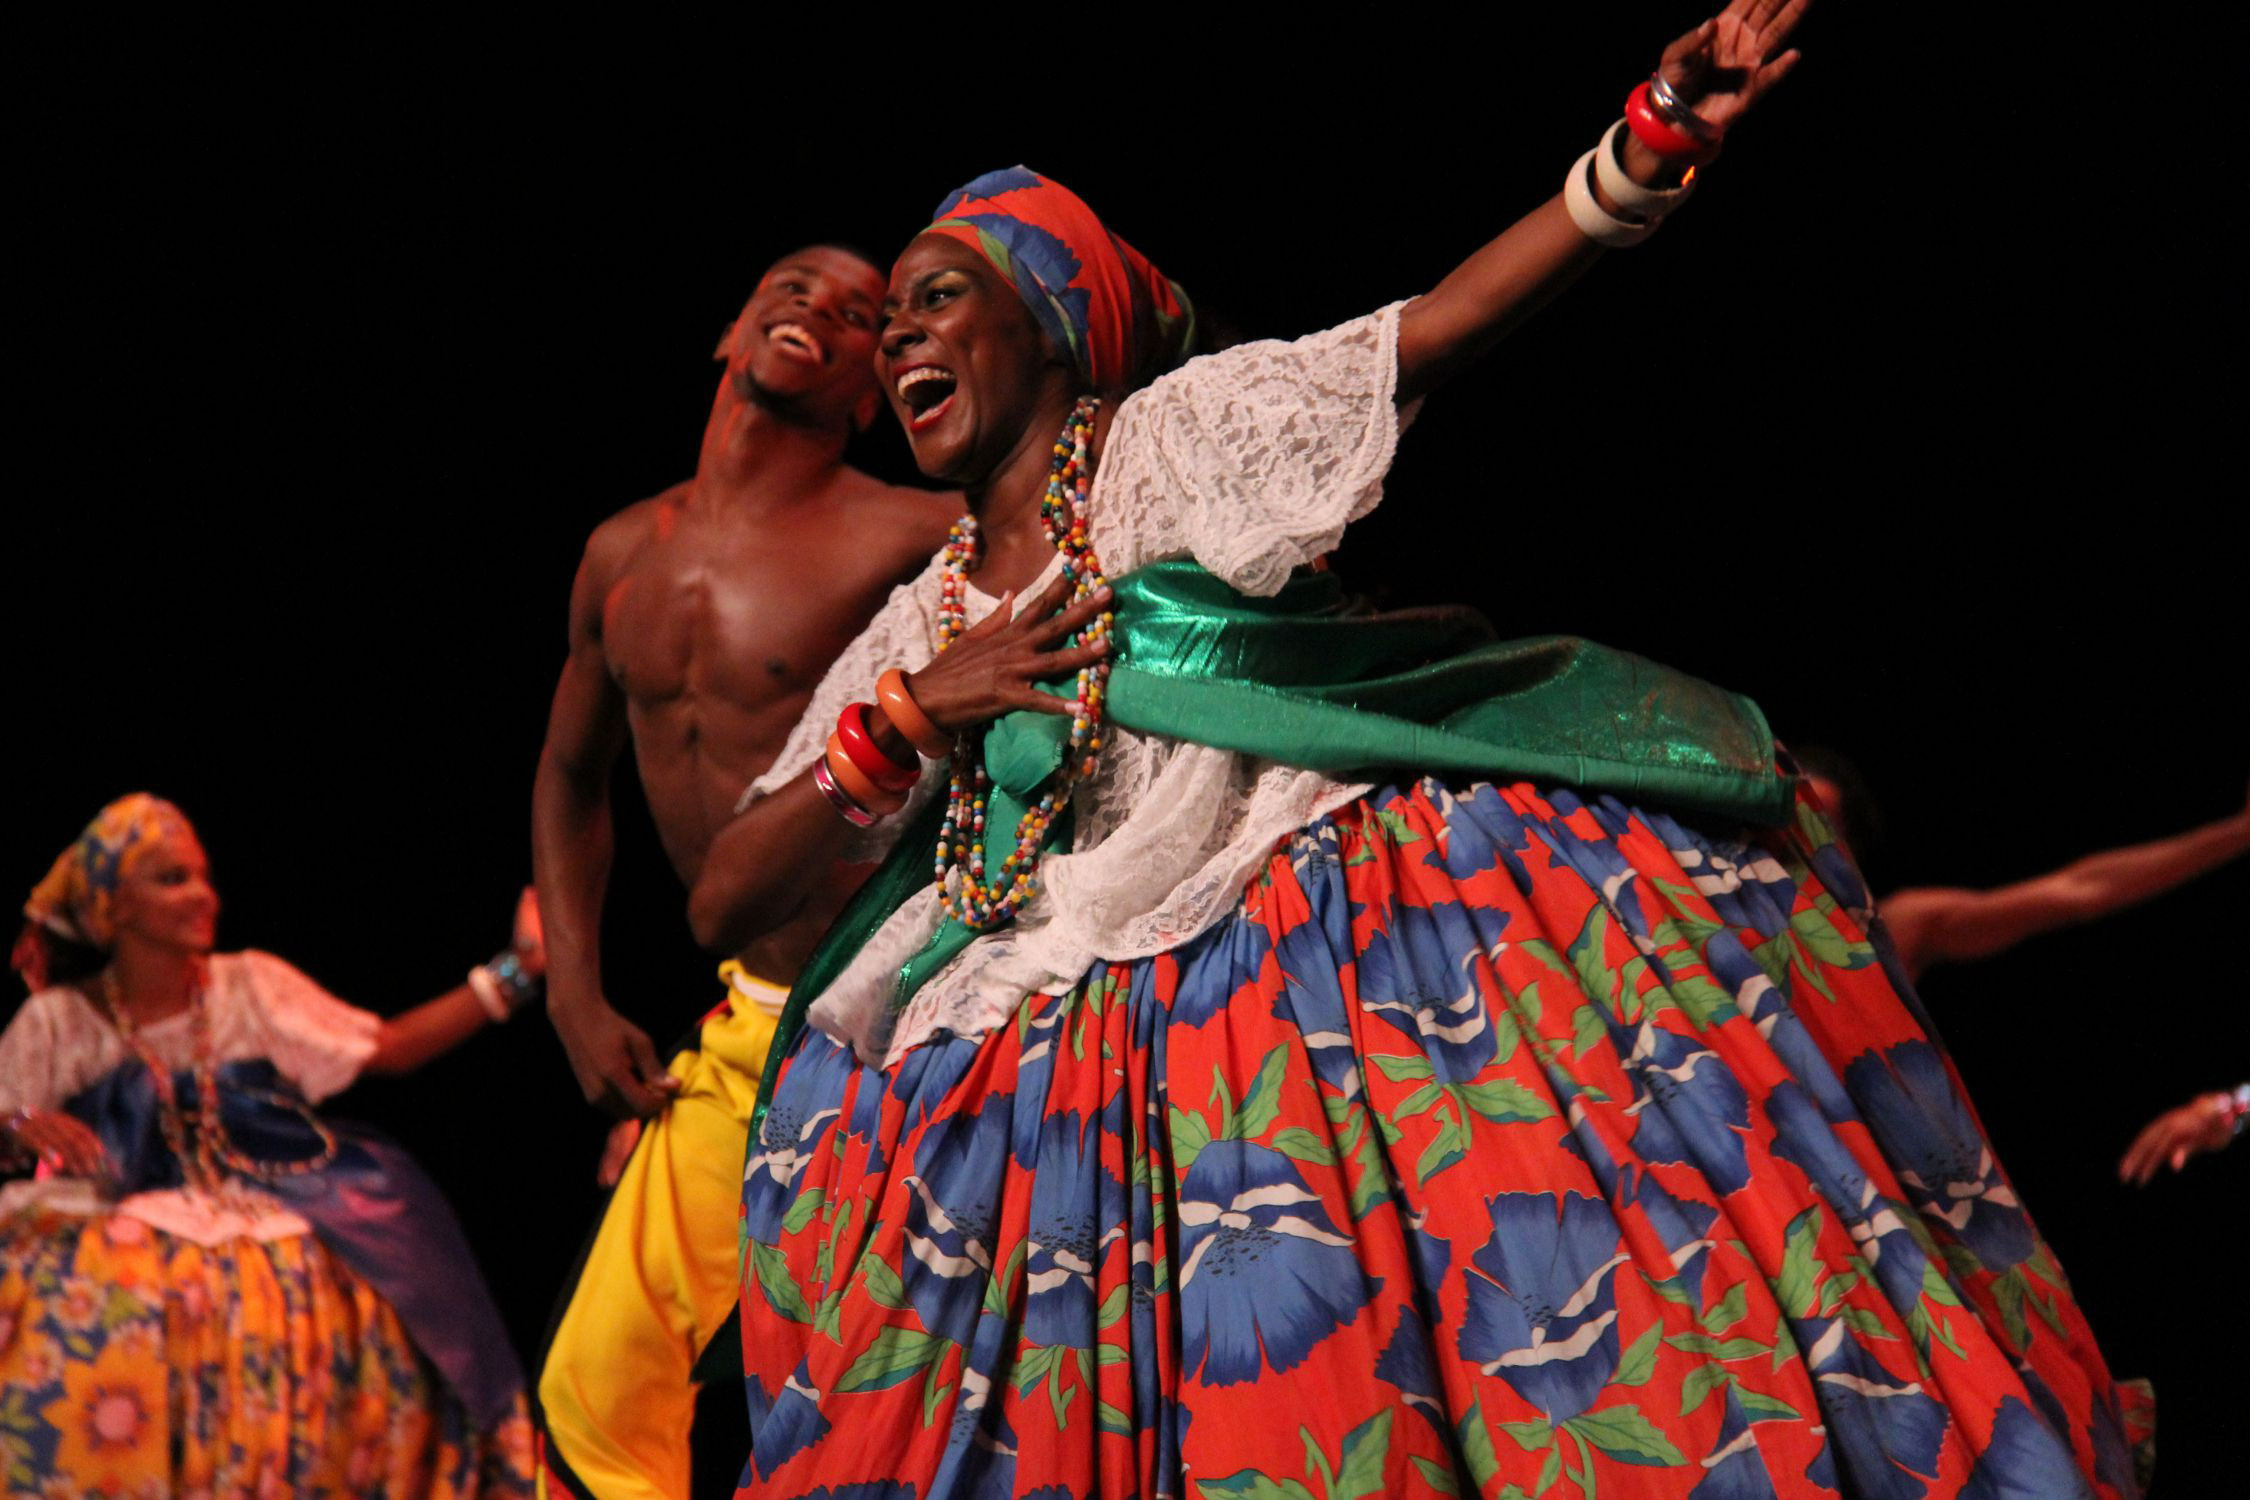 Bahia folklore, Brazil